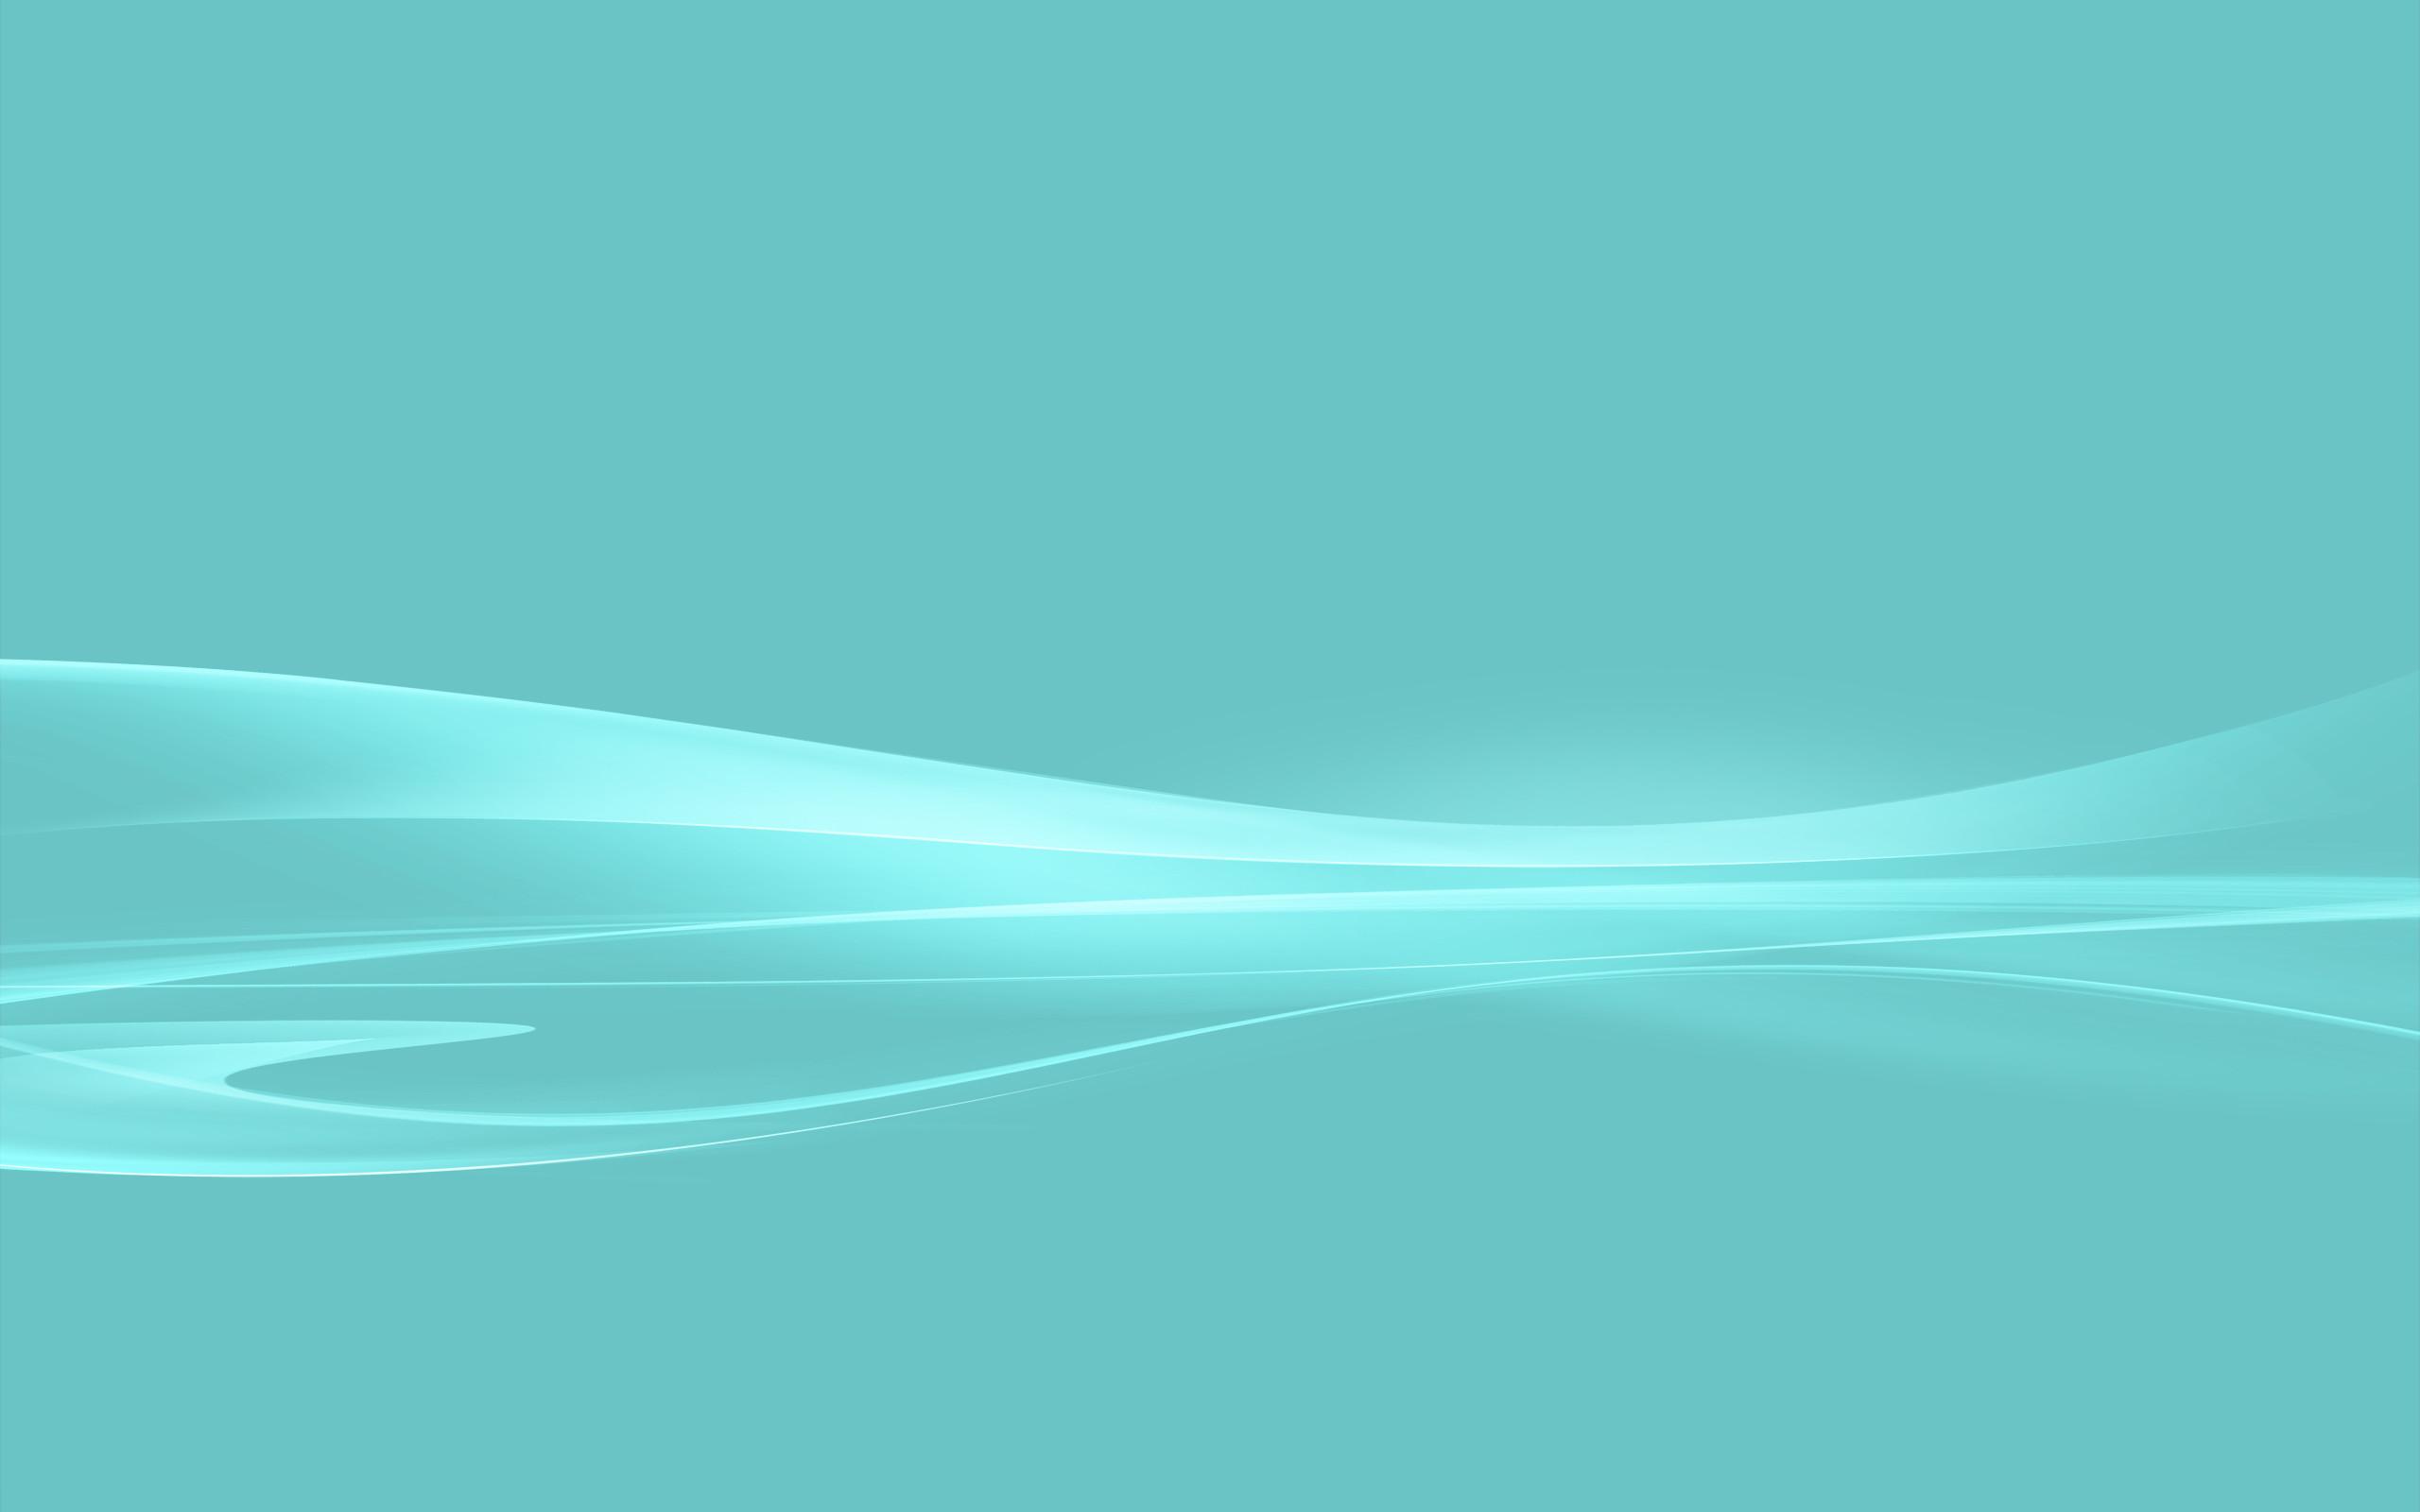 Blue background abstract | Desktop Background | Pinterest | Blue backgrounds